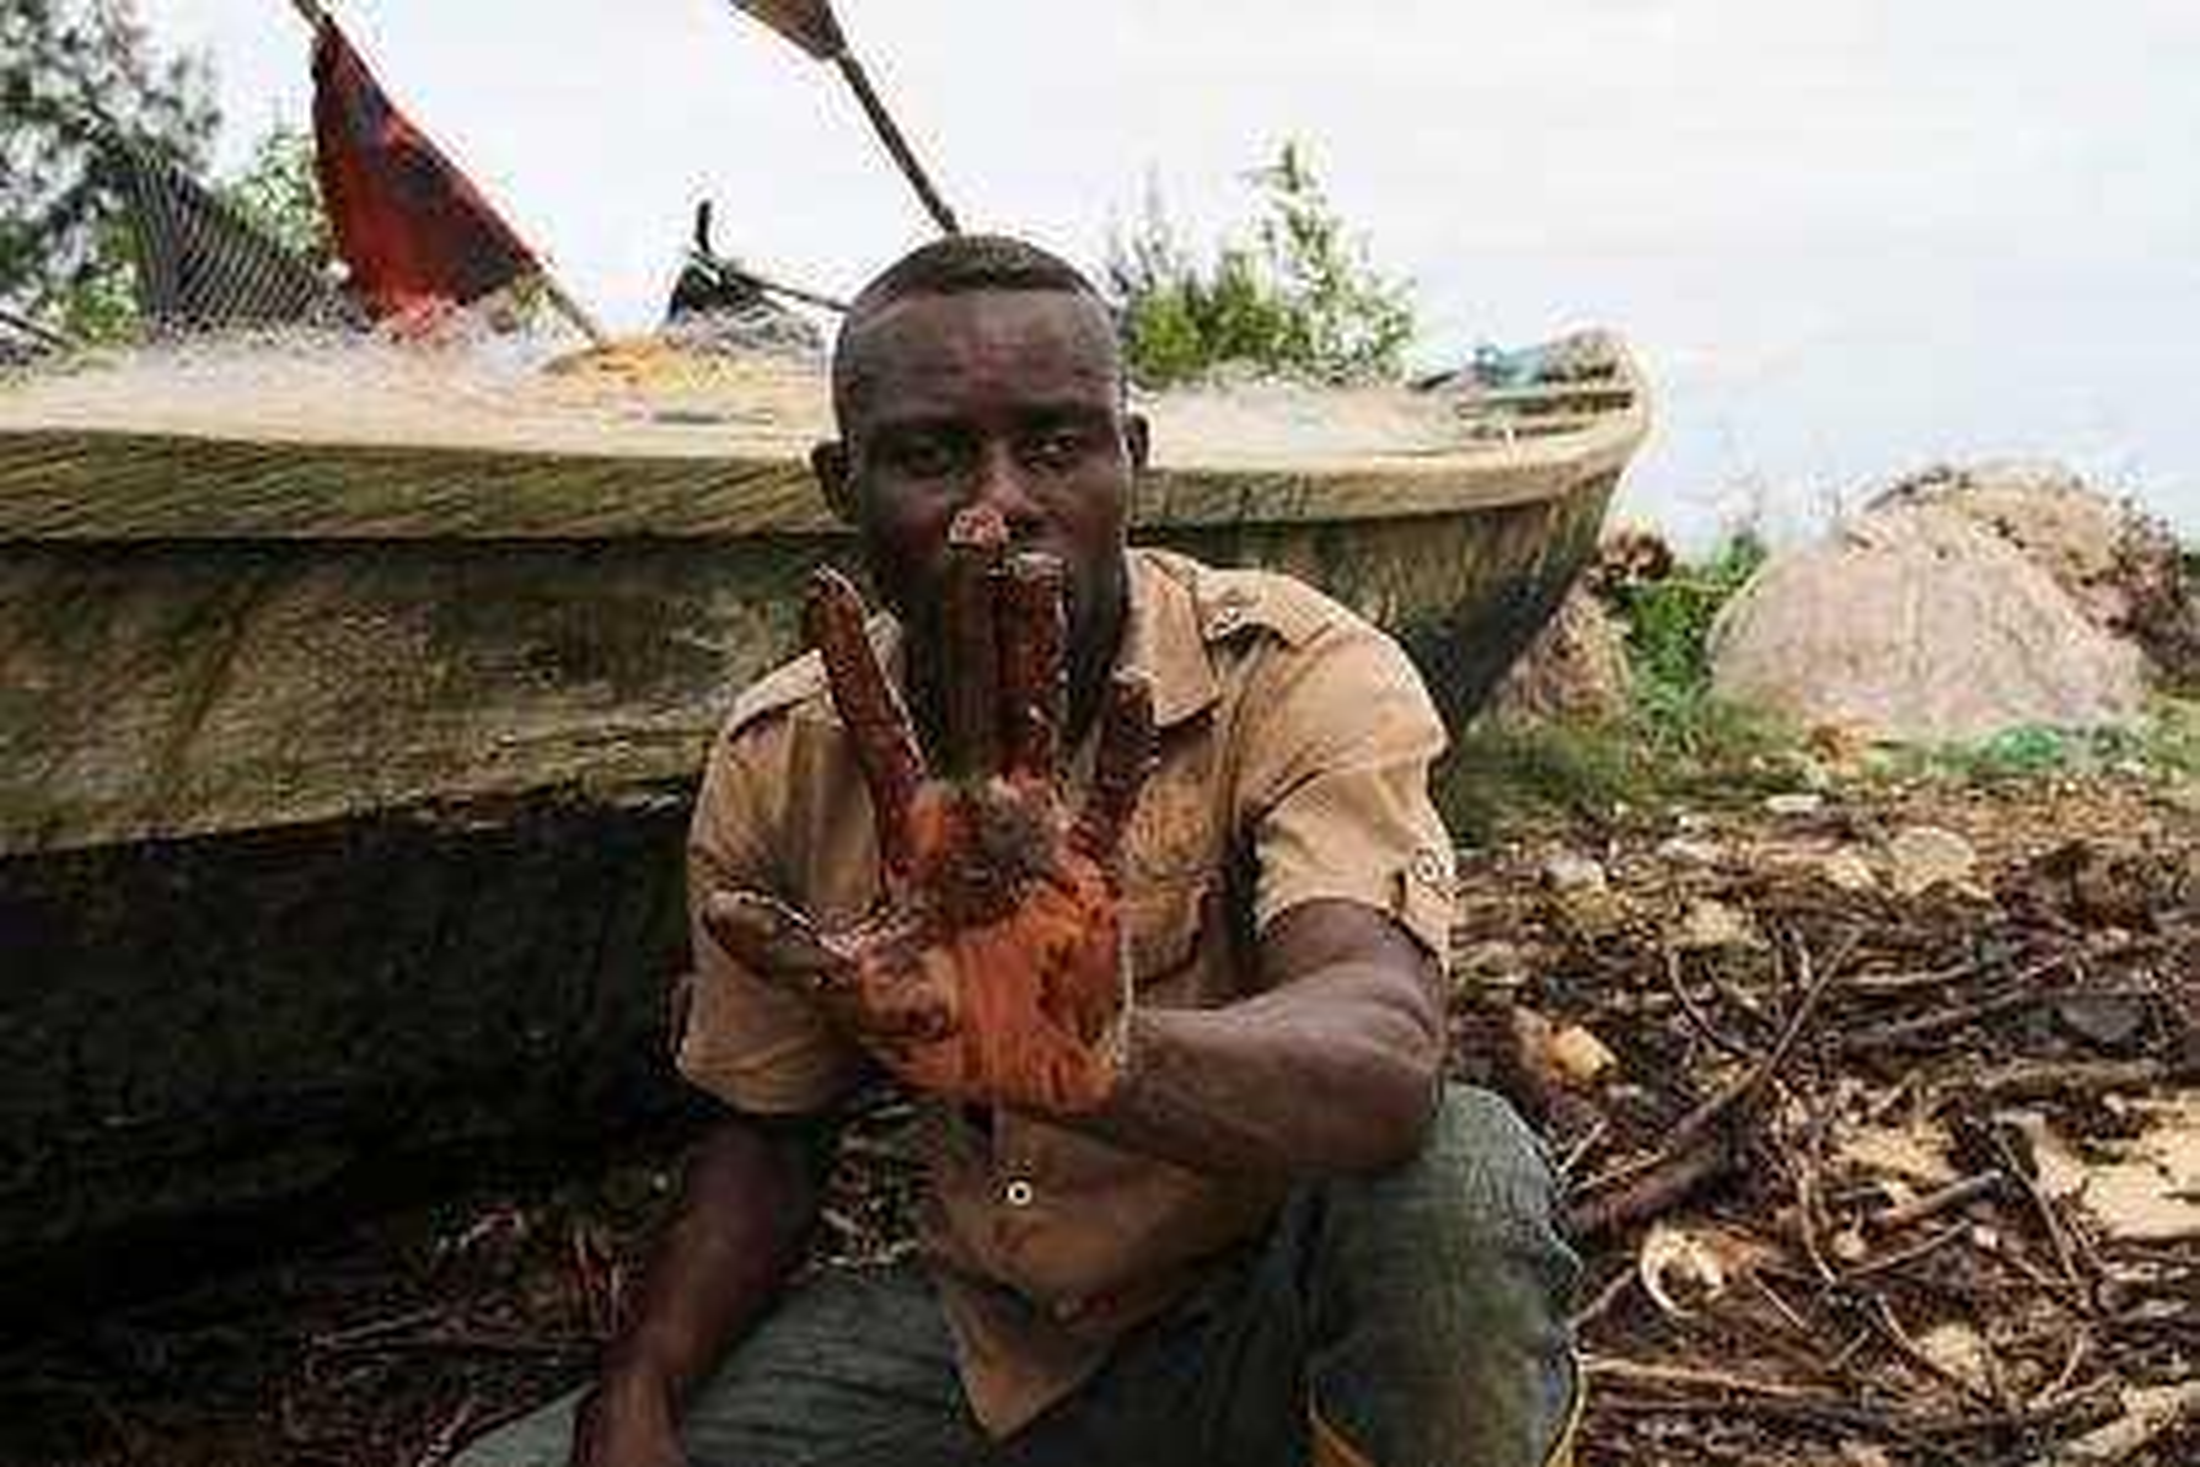 A fisherman shows oil slick